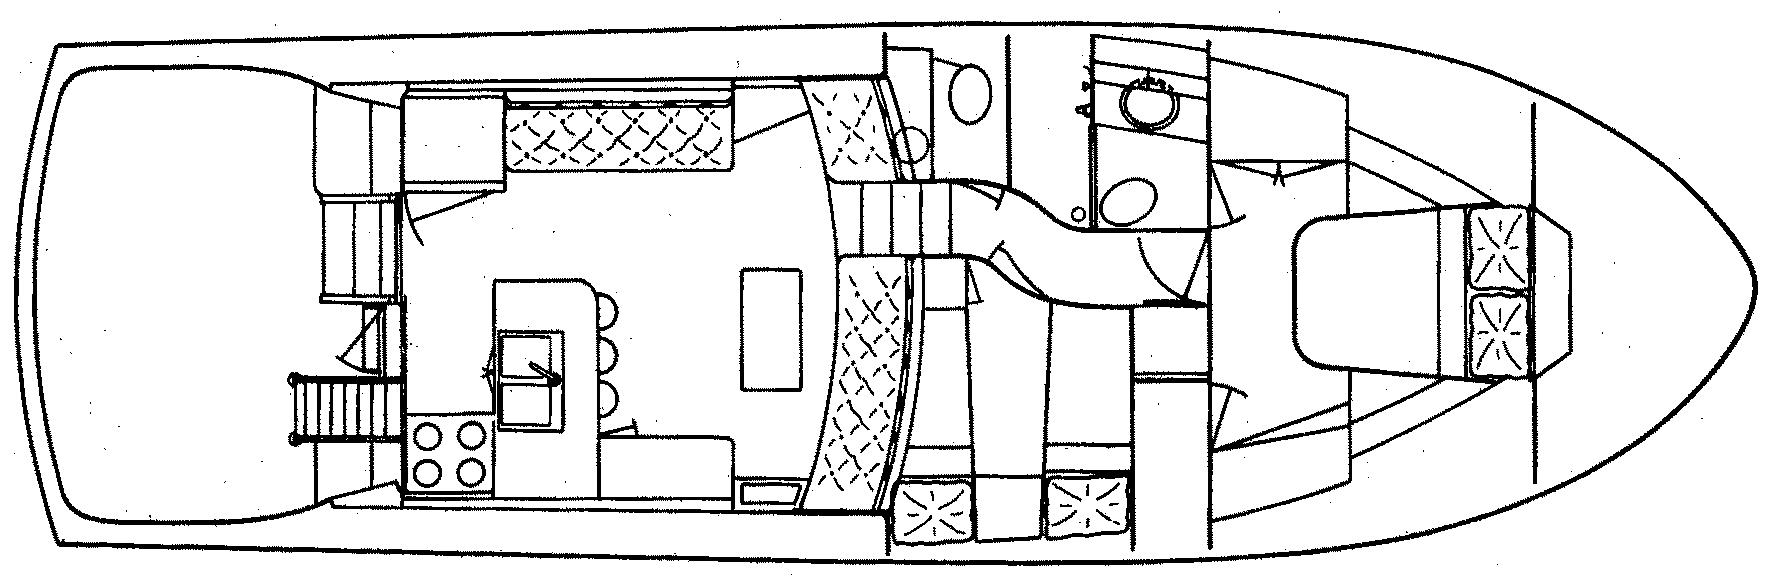 48 Sport Yacht Floor Plan 1